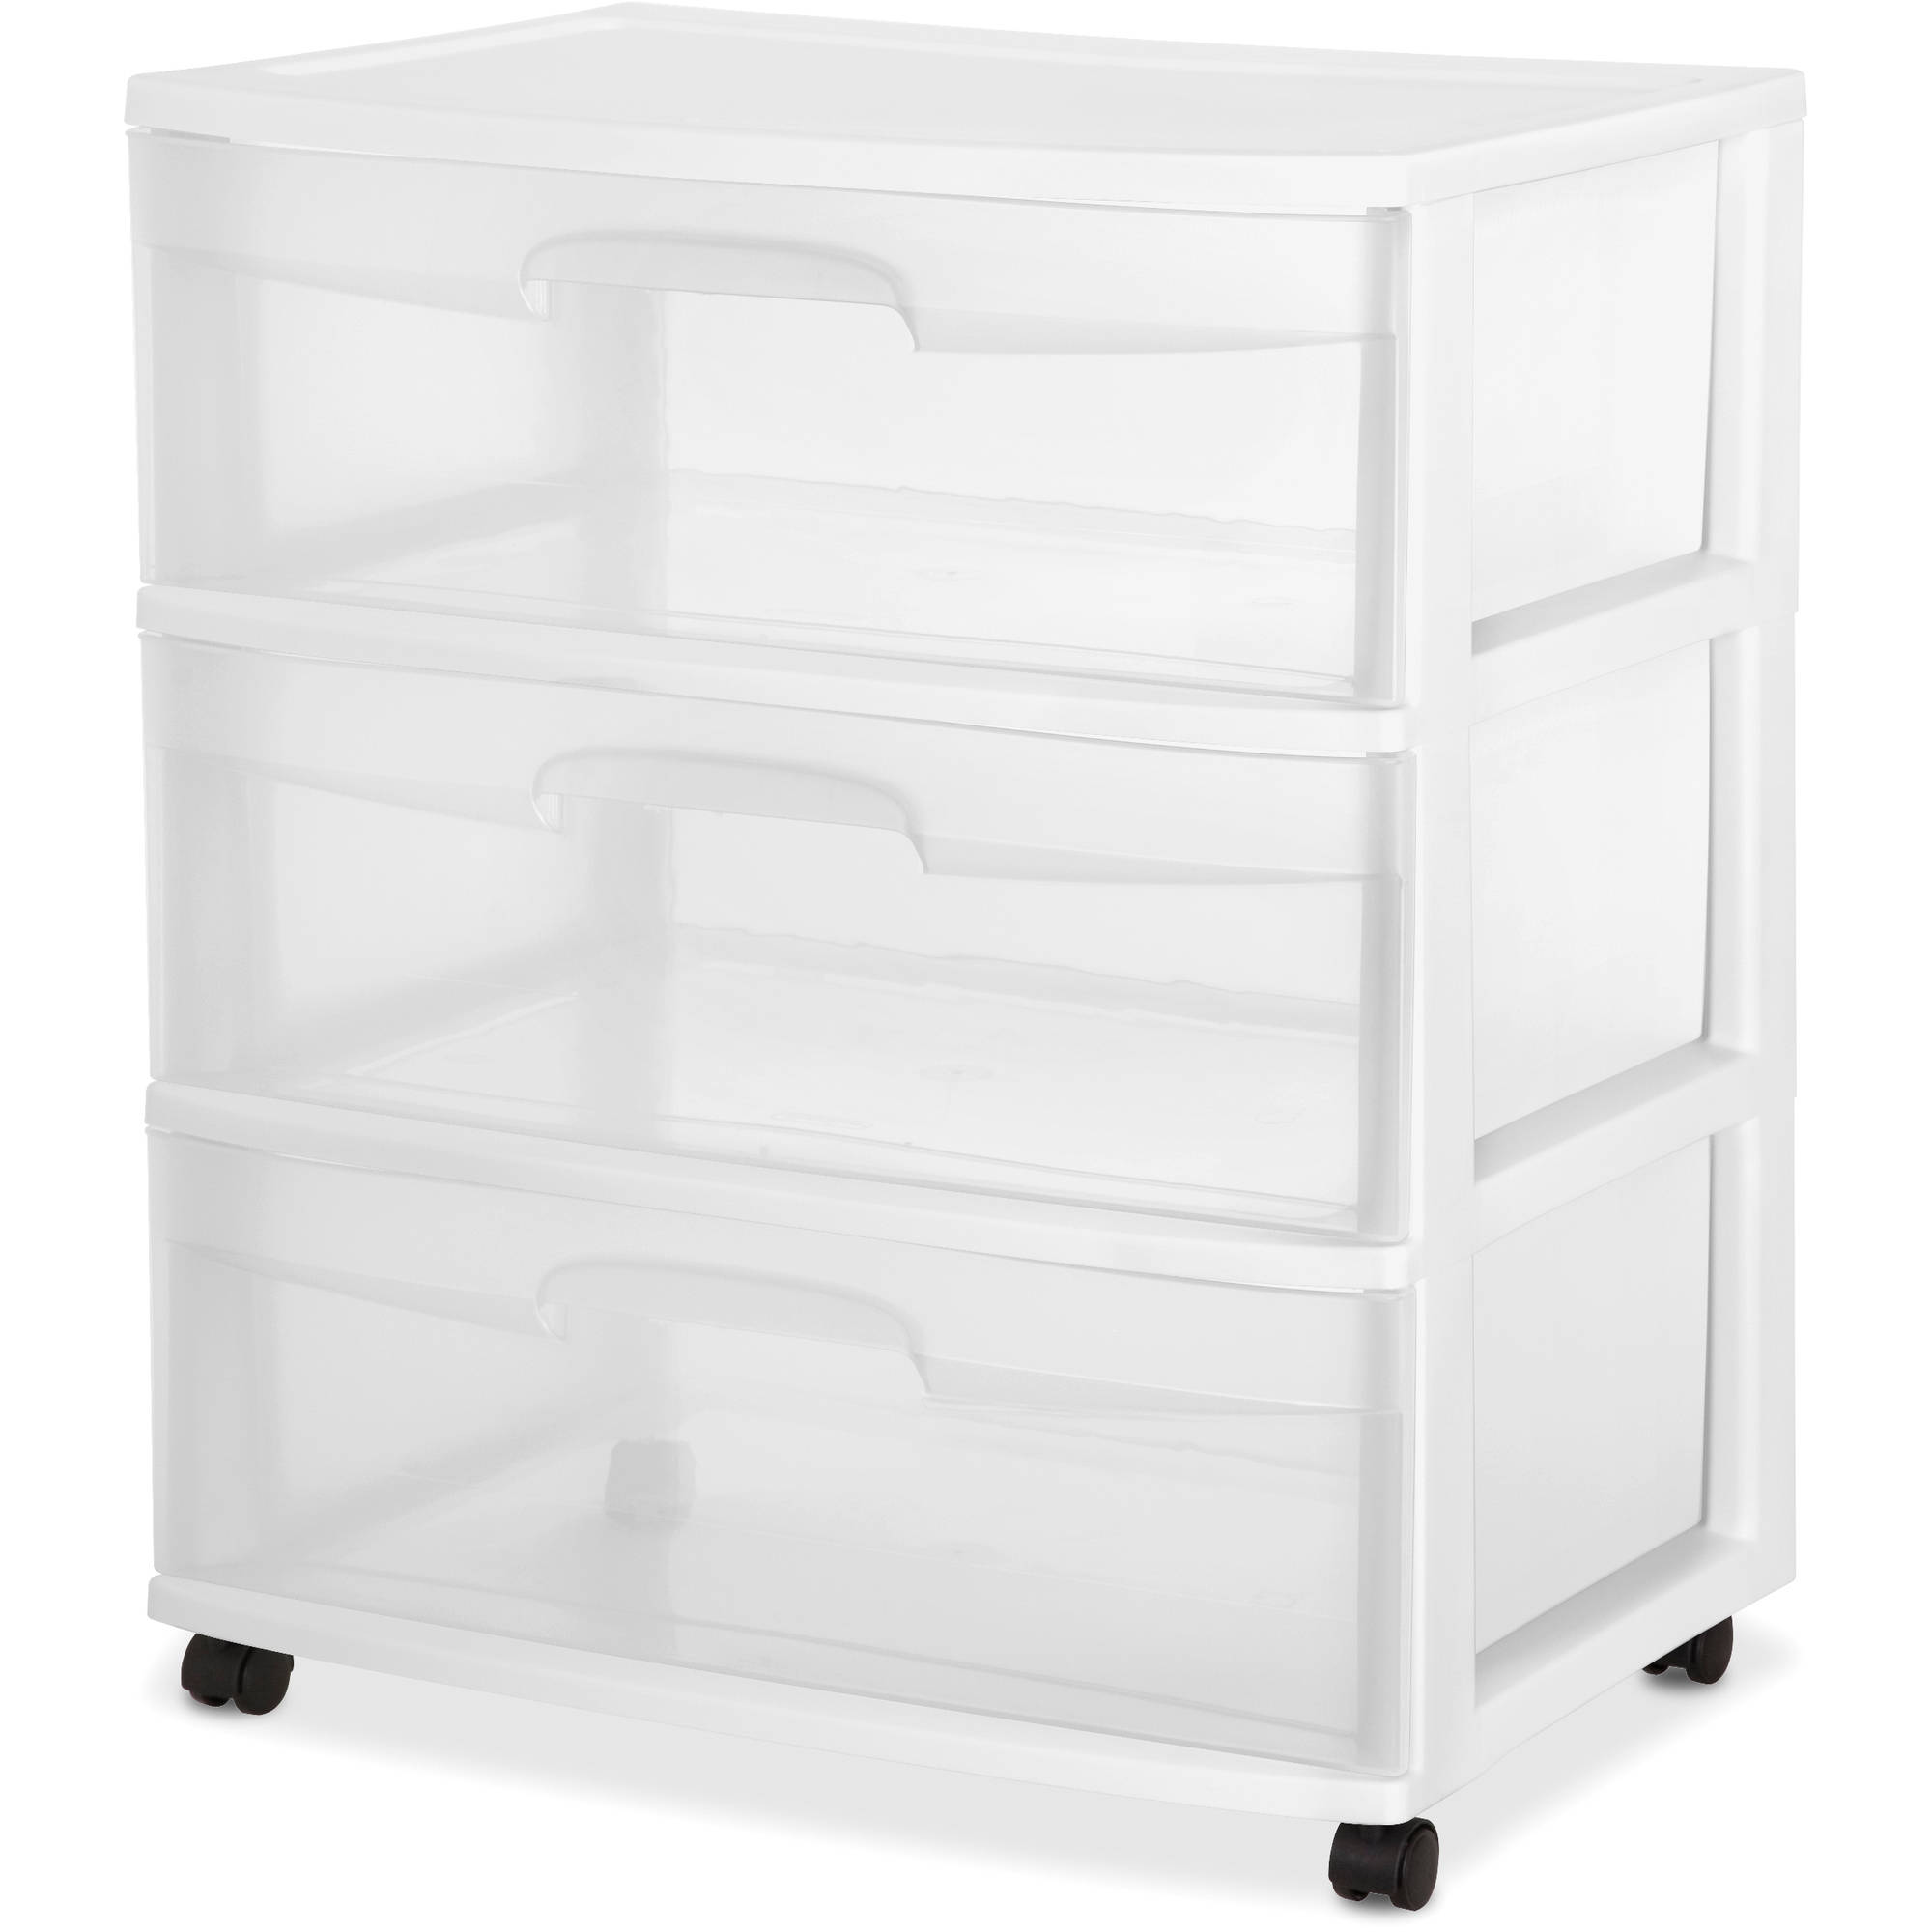 Sterilite 3 Drawer Wide Cart, White